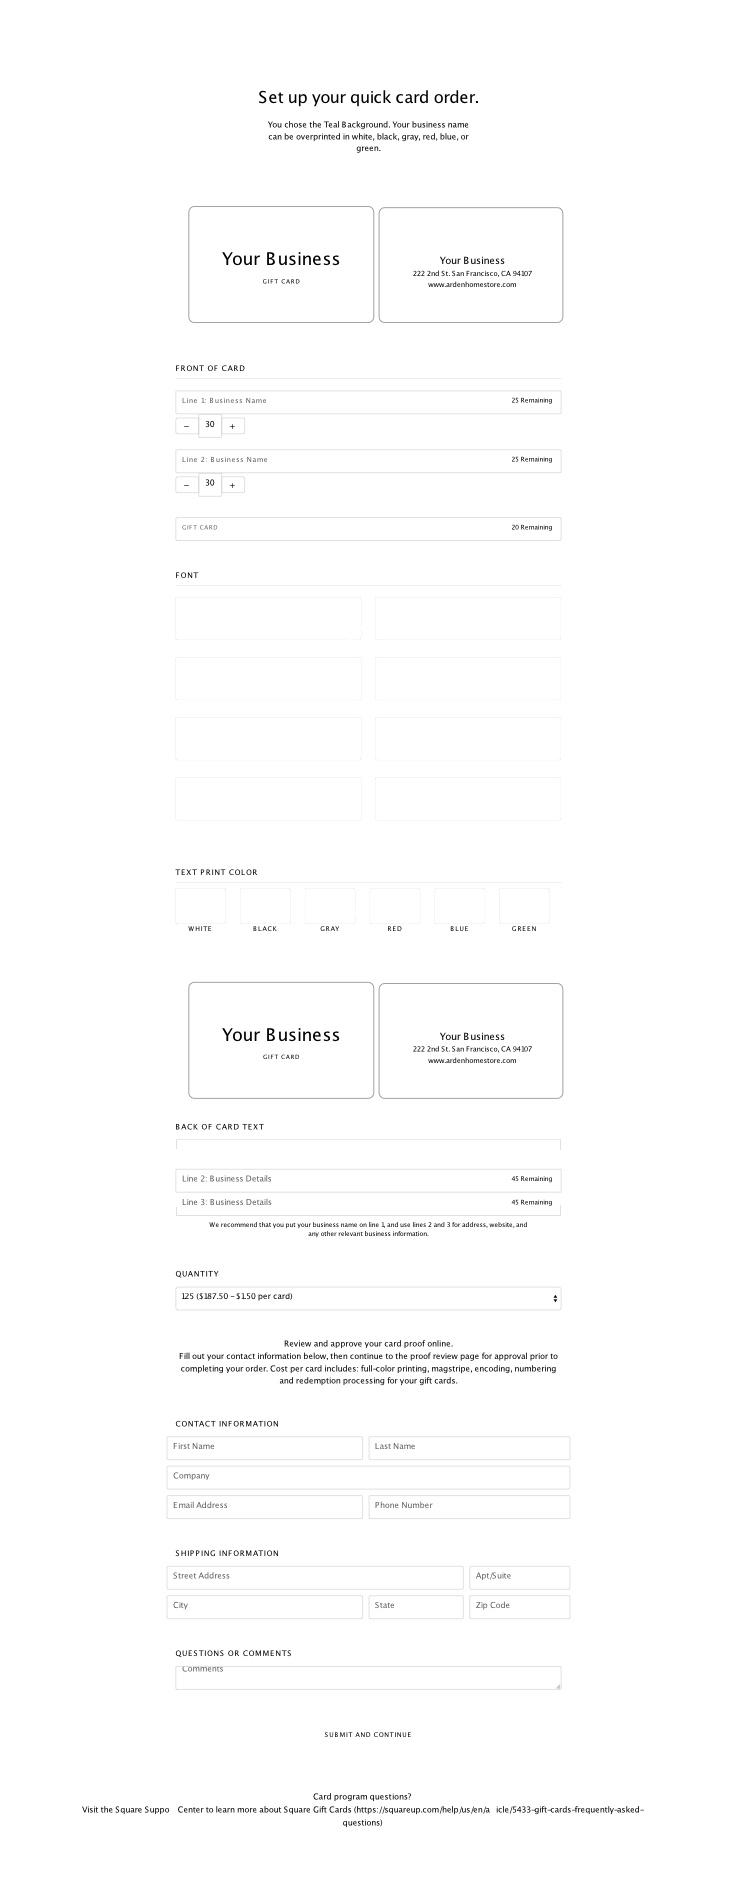 Current Quick Card design feature